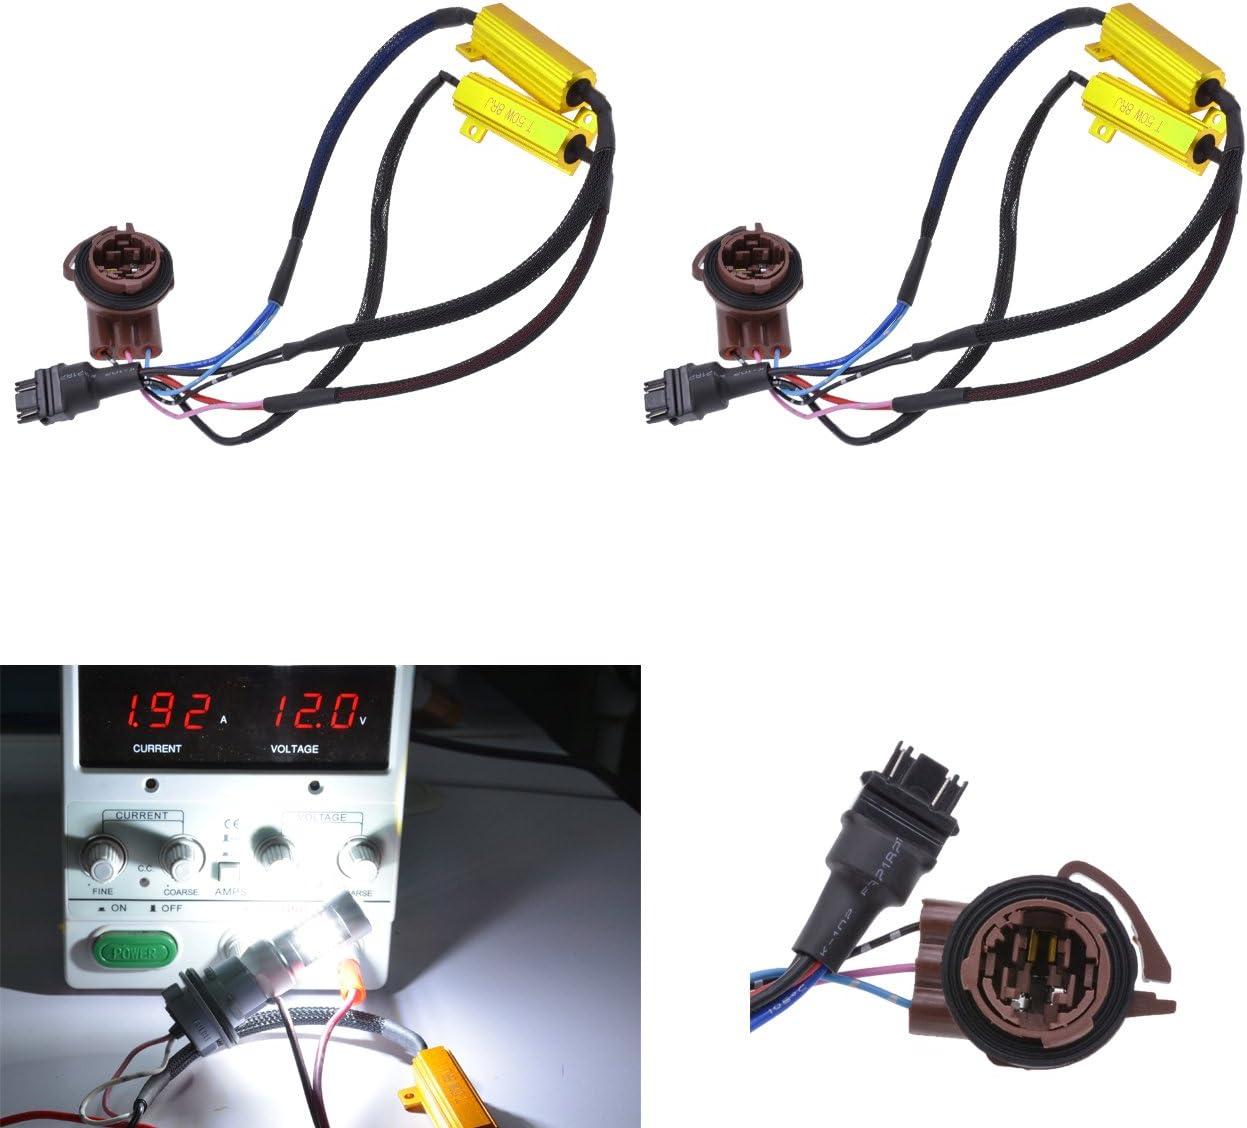 KATUR 2pcs 50W 8ohm 3157 3047 3057 3155 3457 Led Load Resistors - Fix LED Bulb Fast Hyper Flash for LED Turn Signal Light Blink or LED License Plate Lights Error